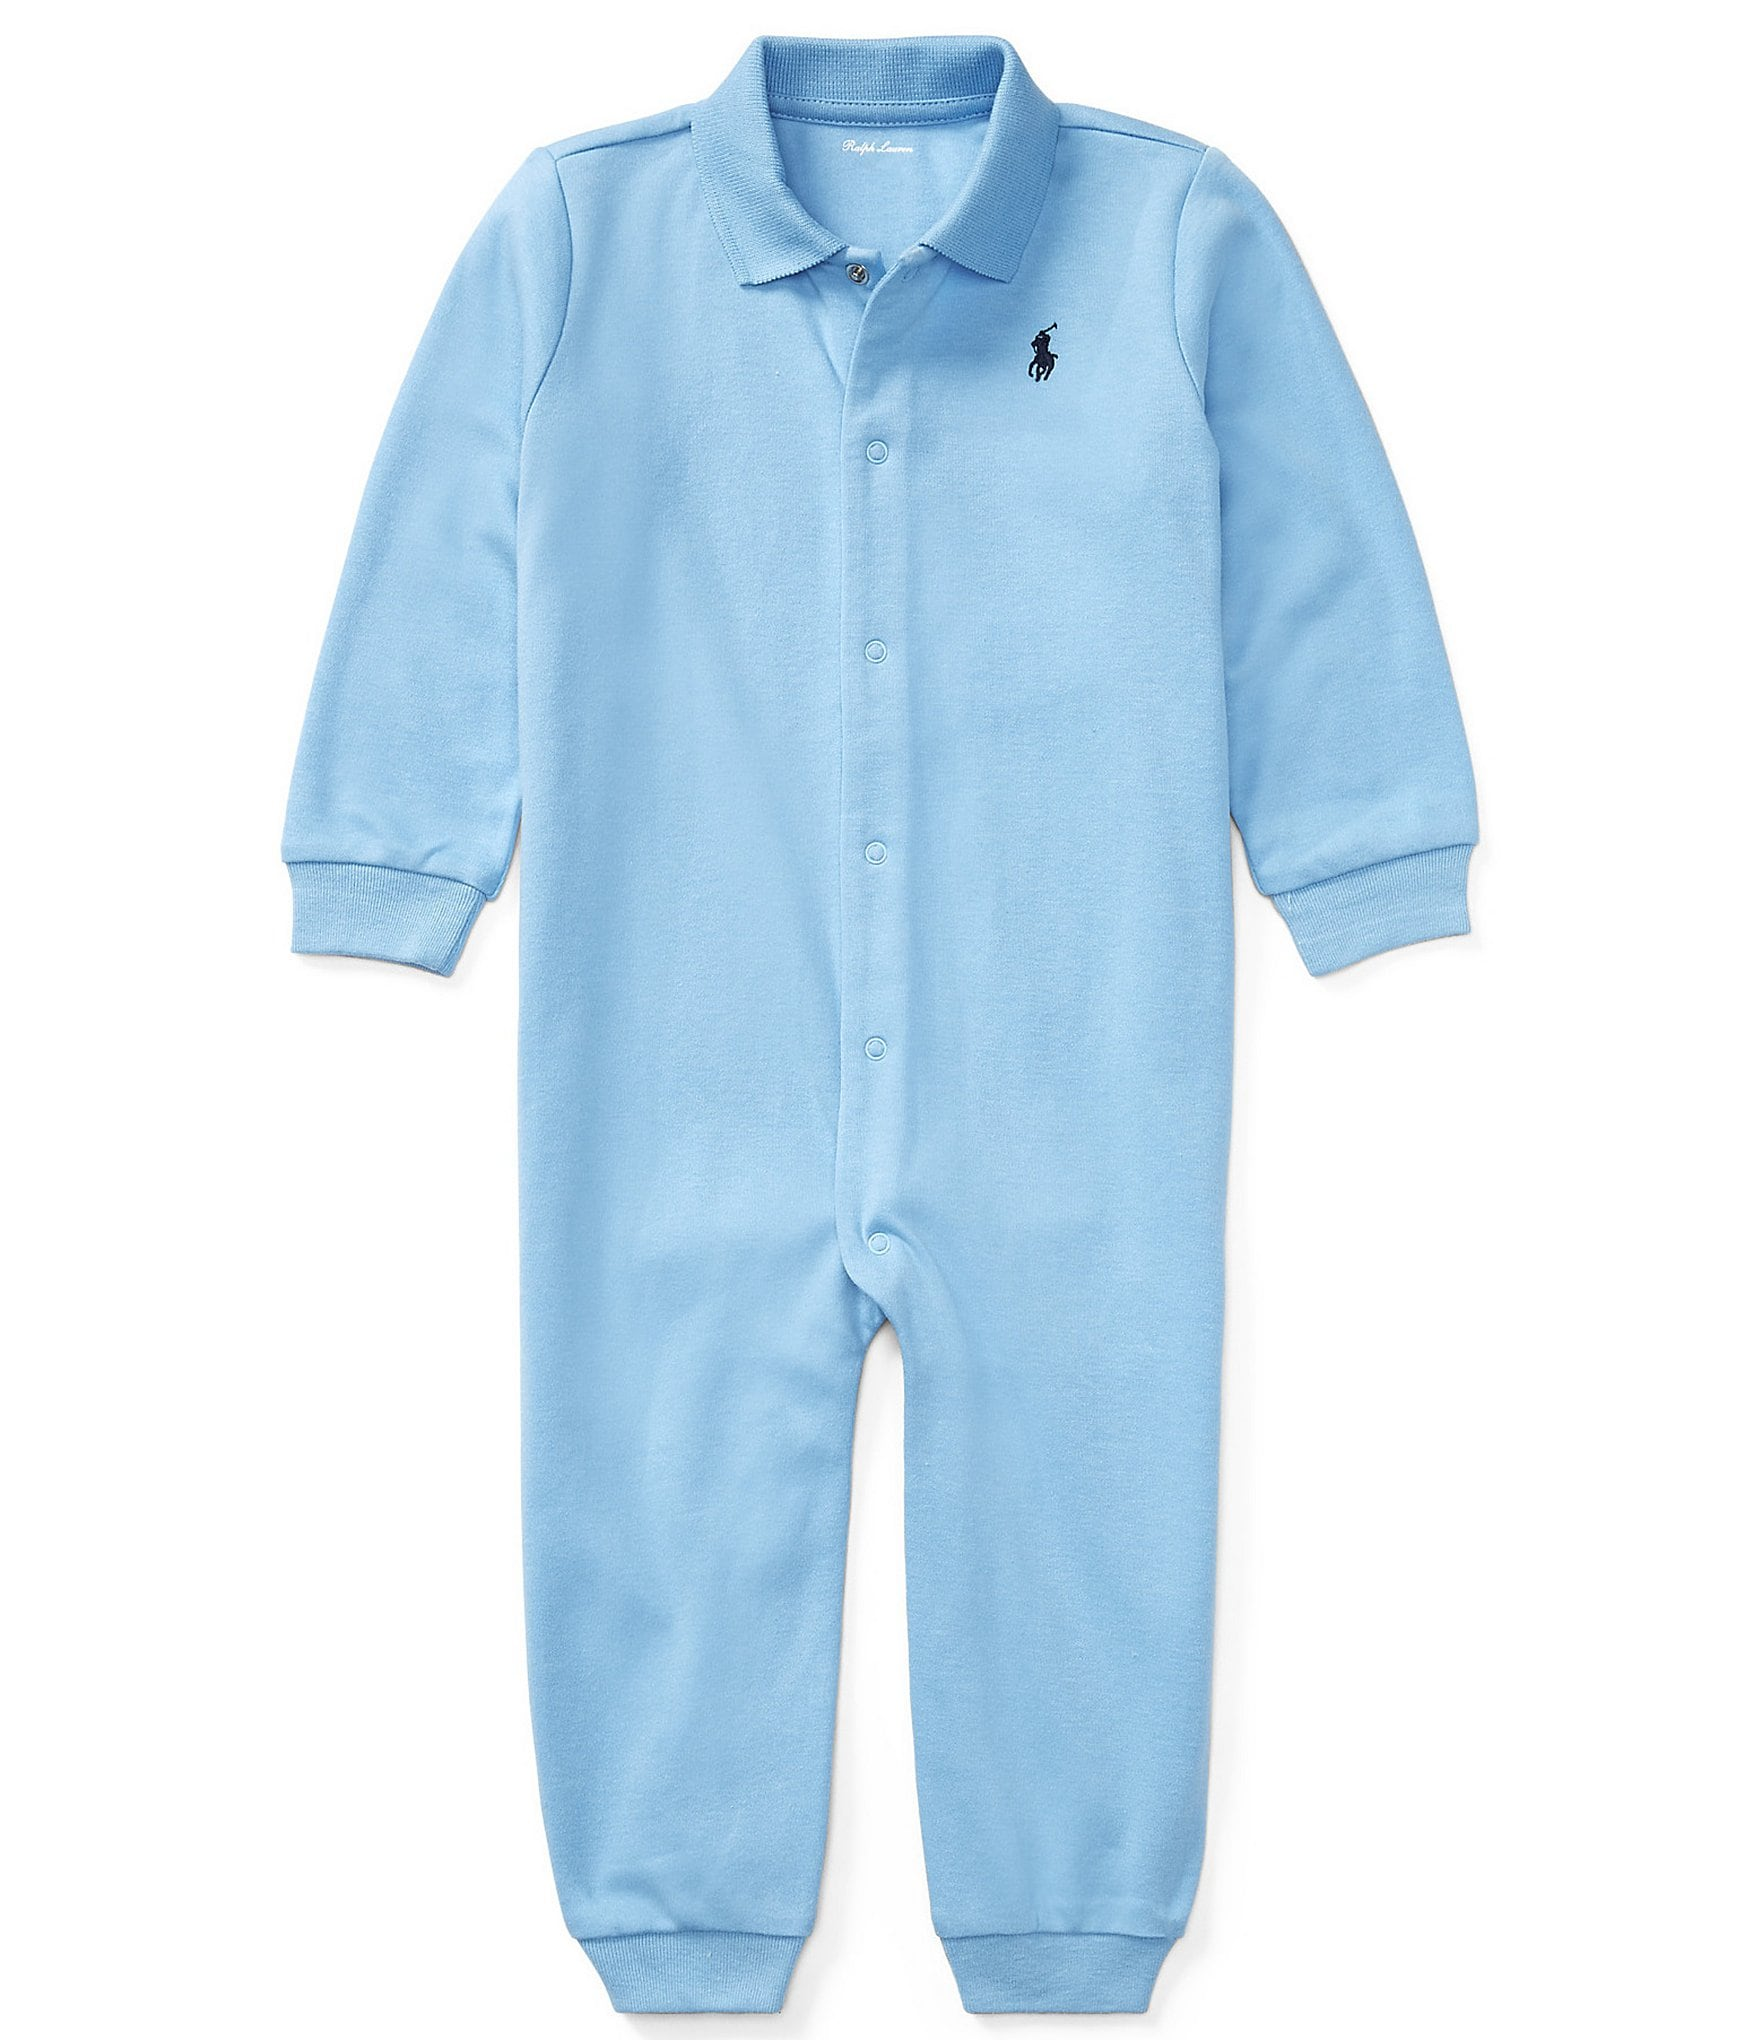 b3752c6b5b32 Ralph LaurenChildrenswear Baby Boys Newborn-12 Months Classic Coverall